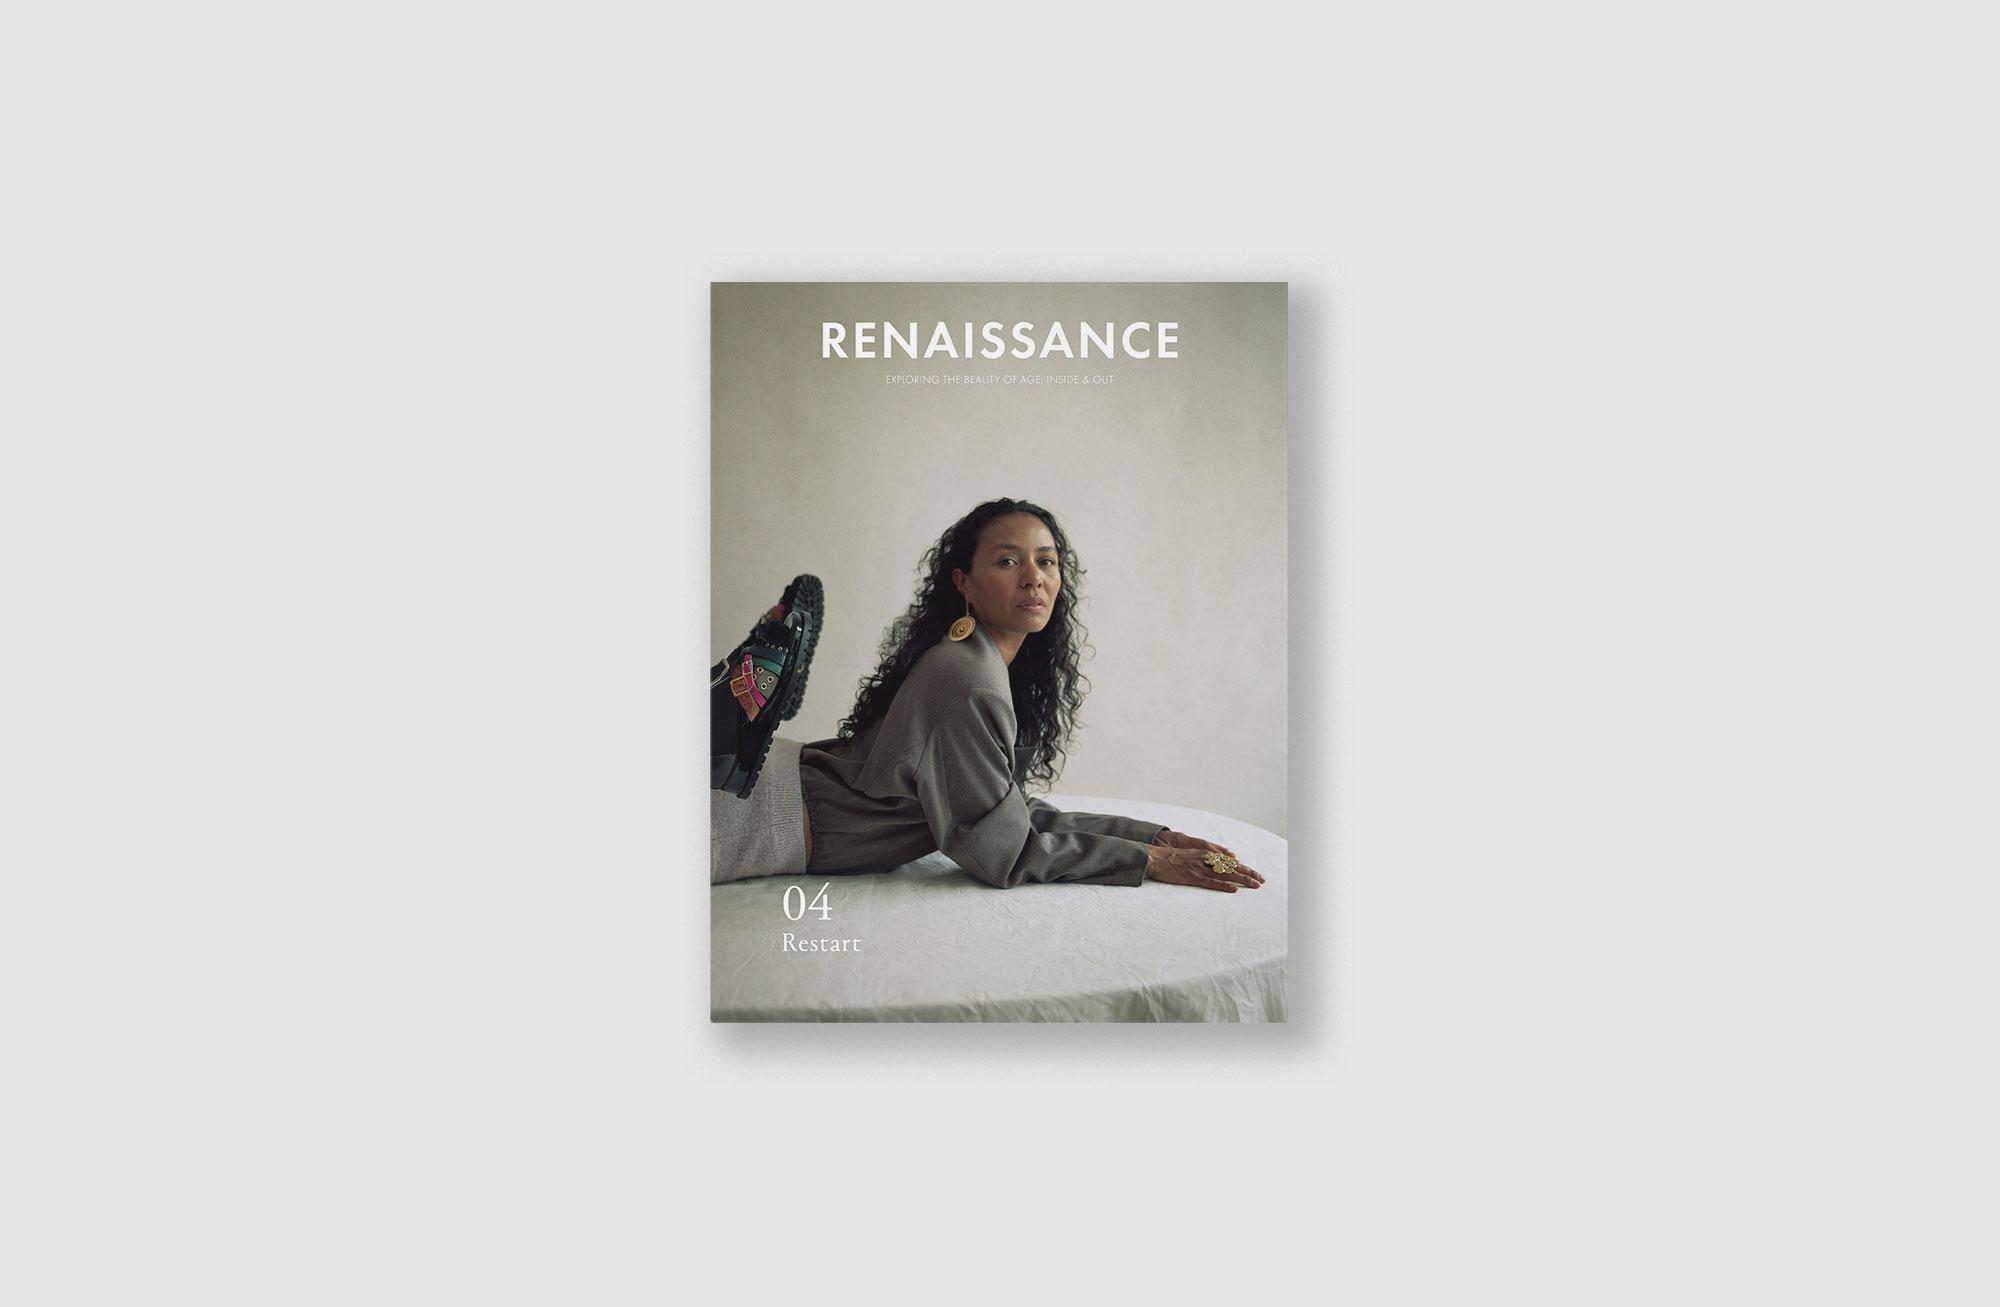 renaissance-03-2.jpg